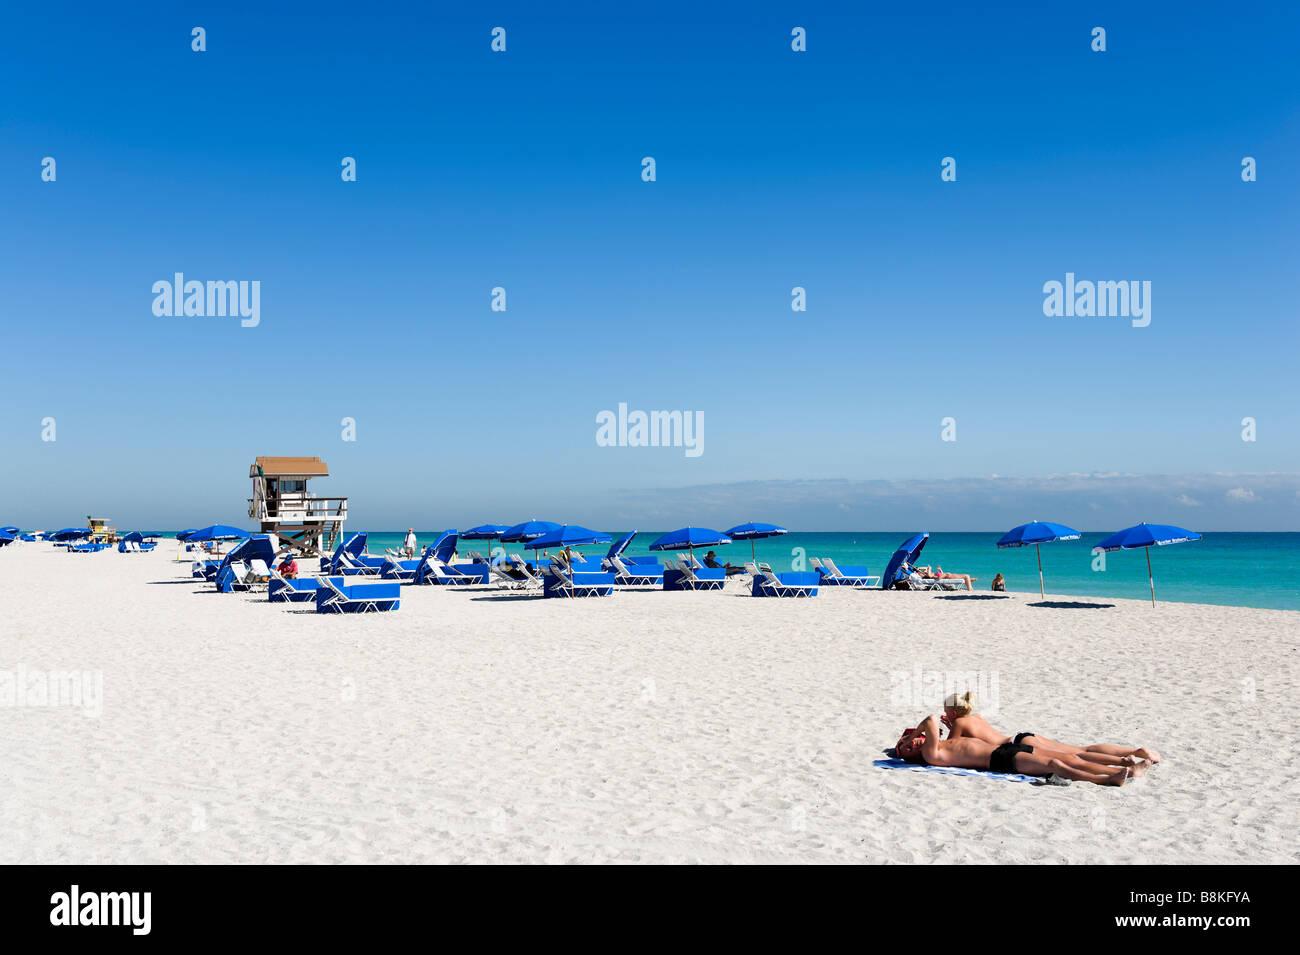 South Beach, Miami Beach, Gold Coast, Florida, USA Photo Stock